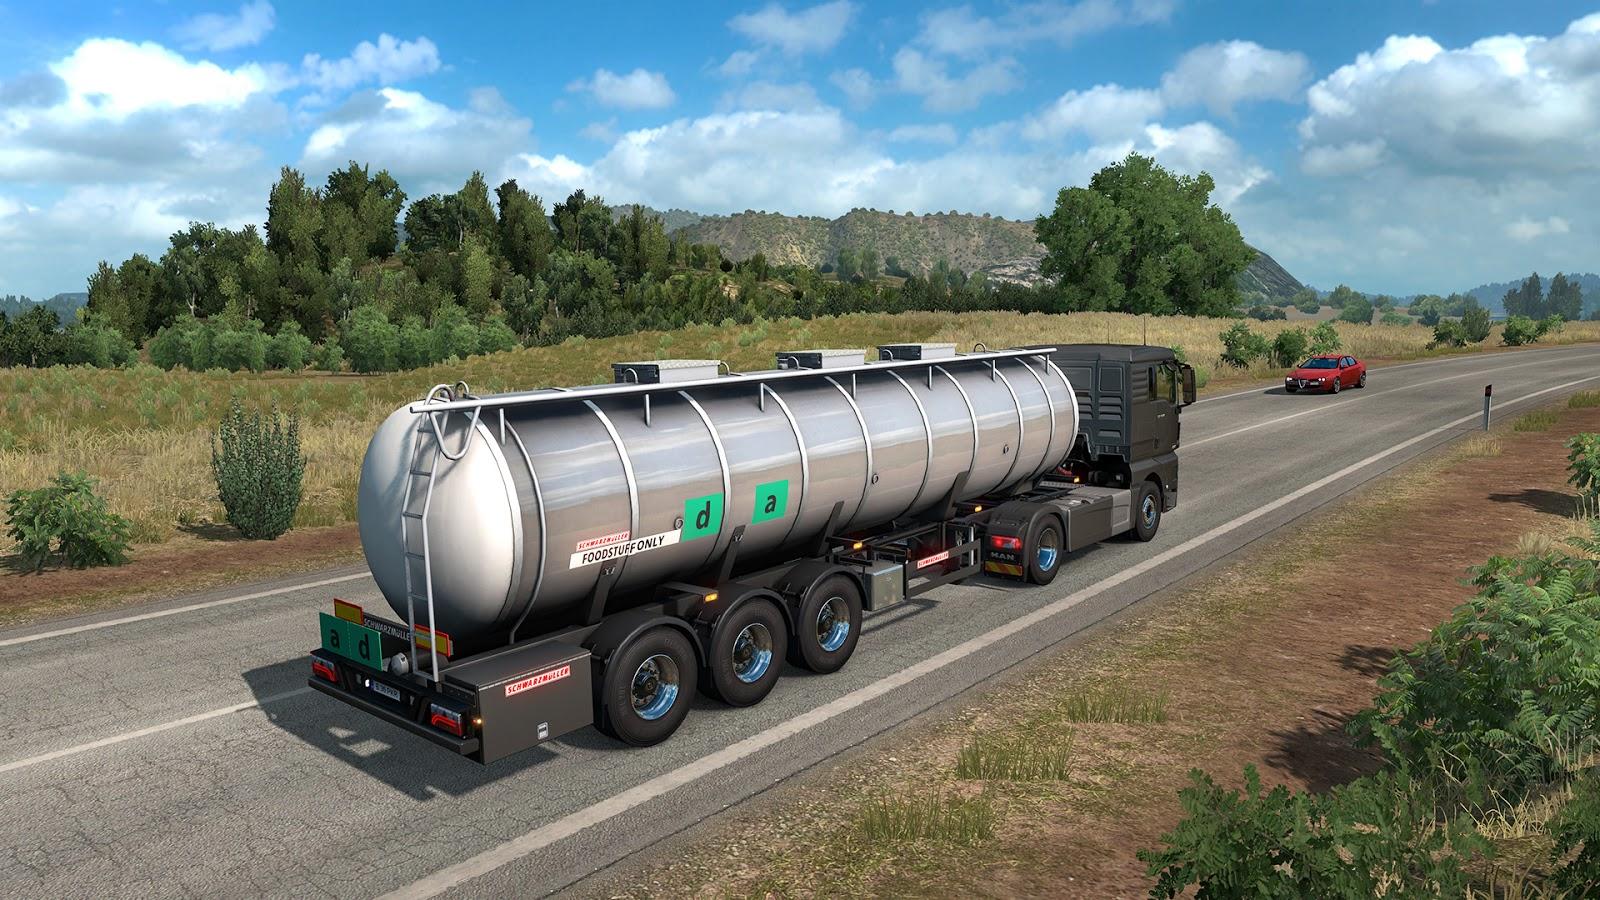 Euro Truck Simulator 2 Update 1.37 Open Beta Released